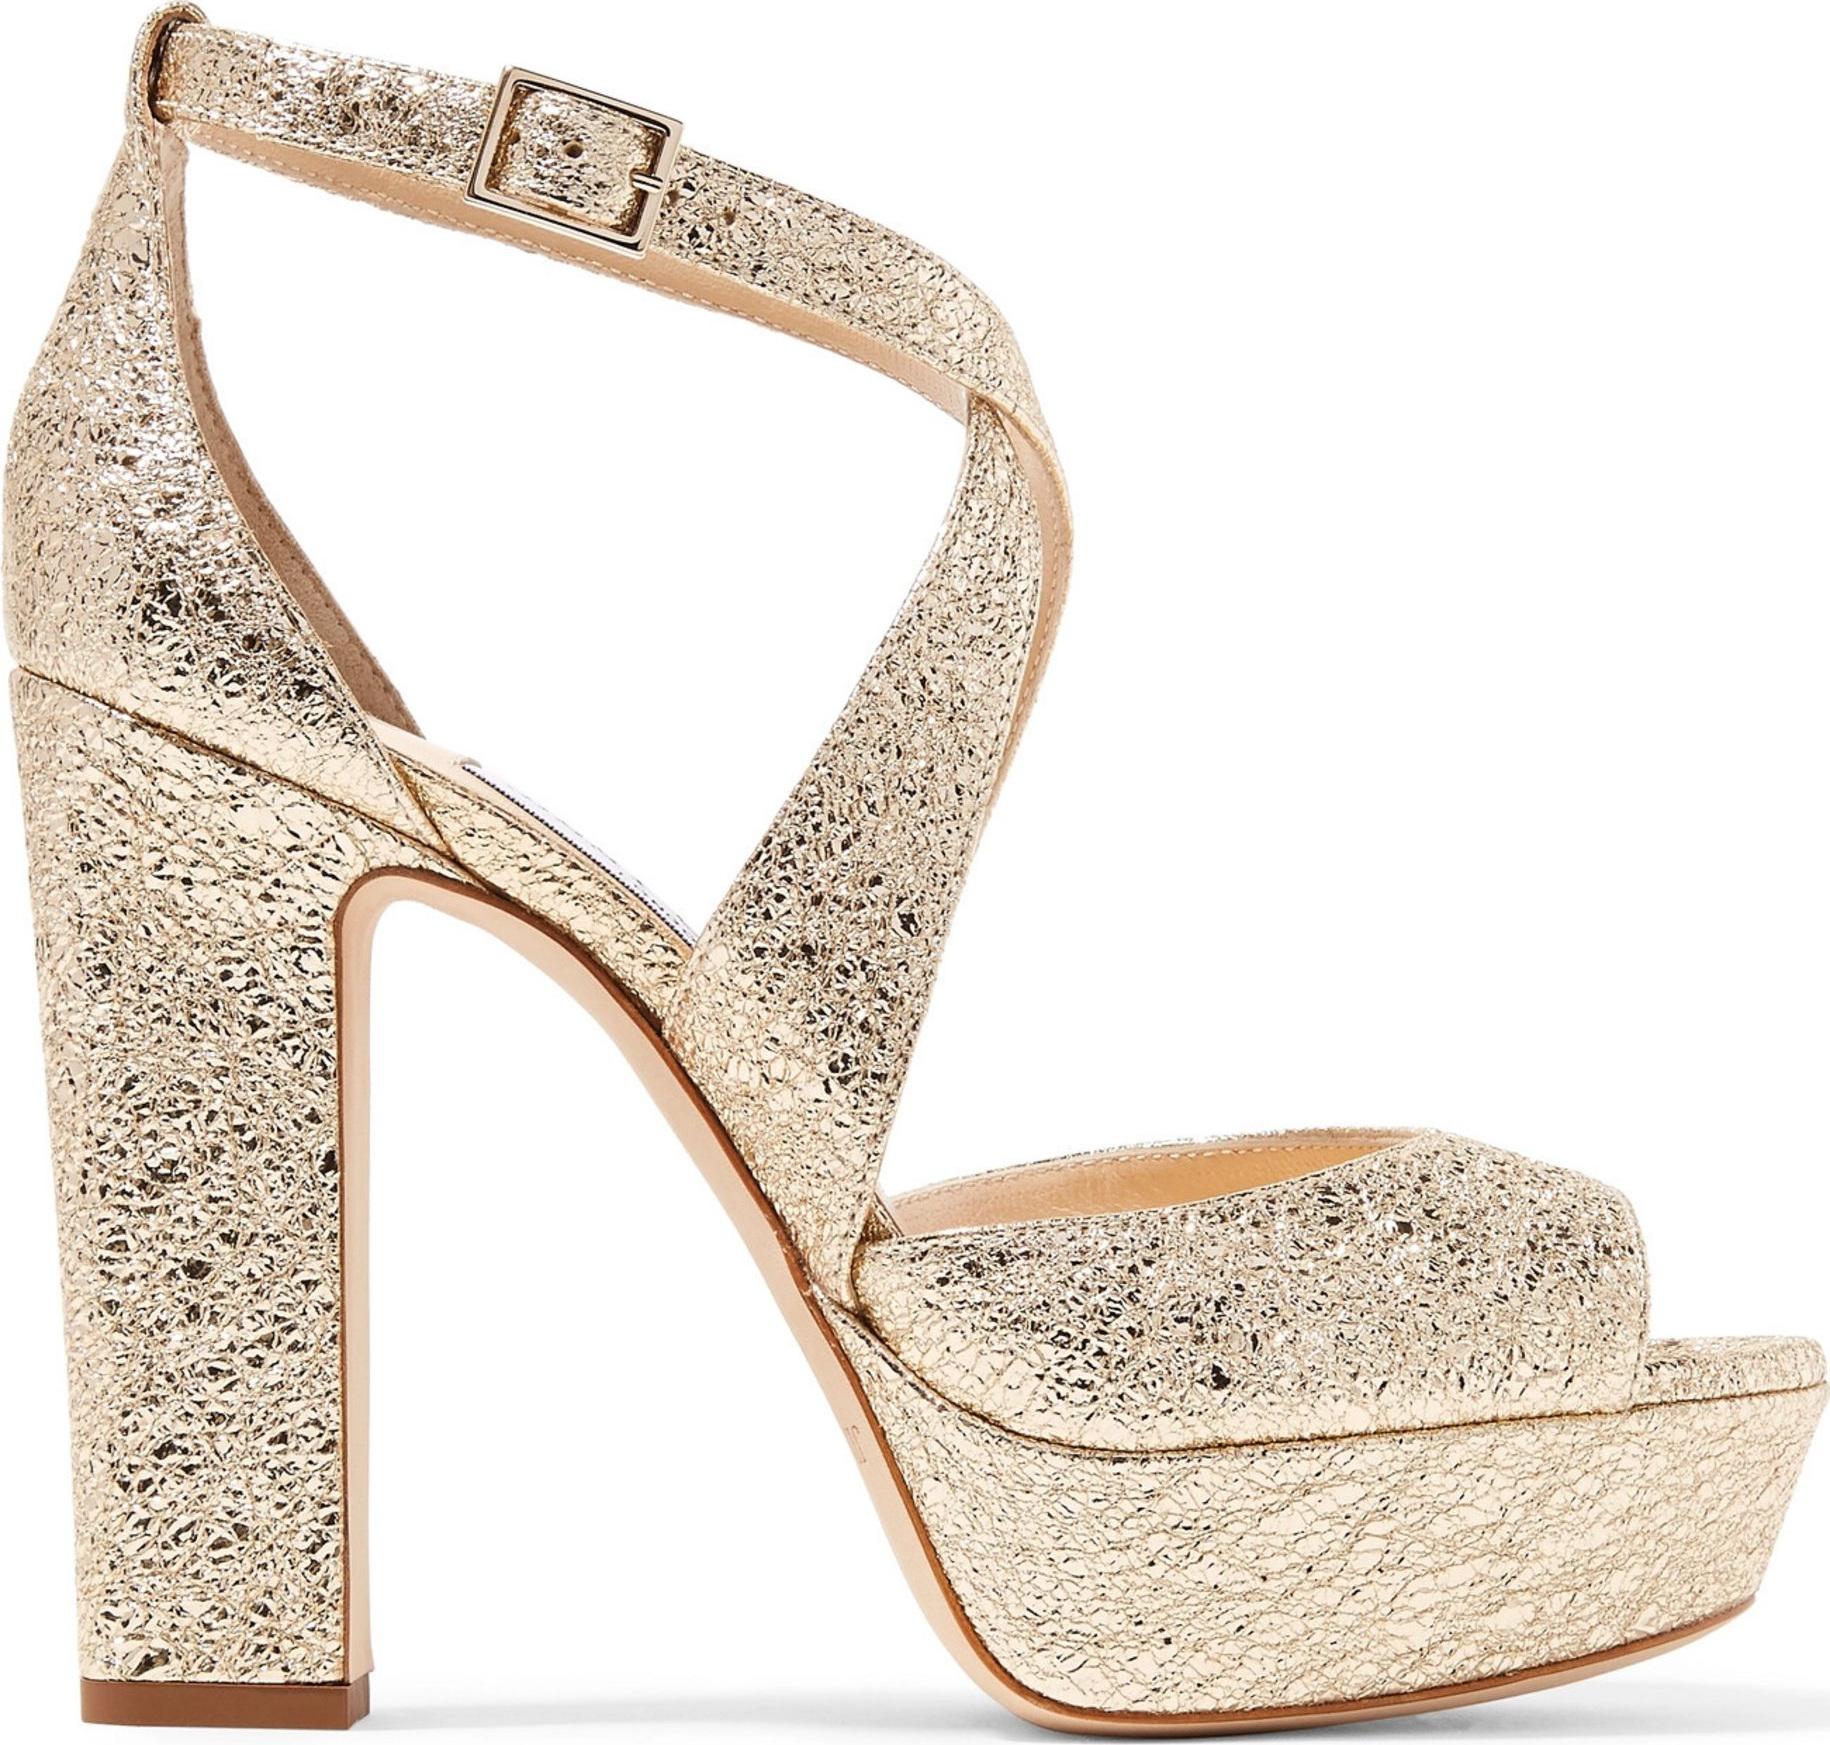 Jimmy Choo - April 120 metallic cracked-leather platform sandals